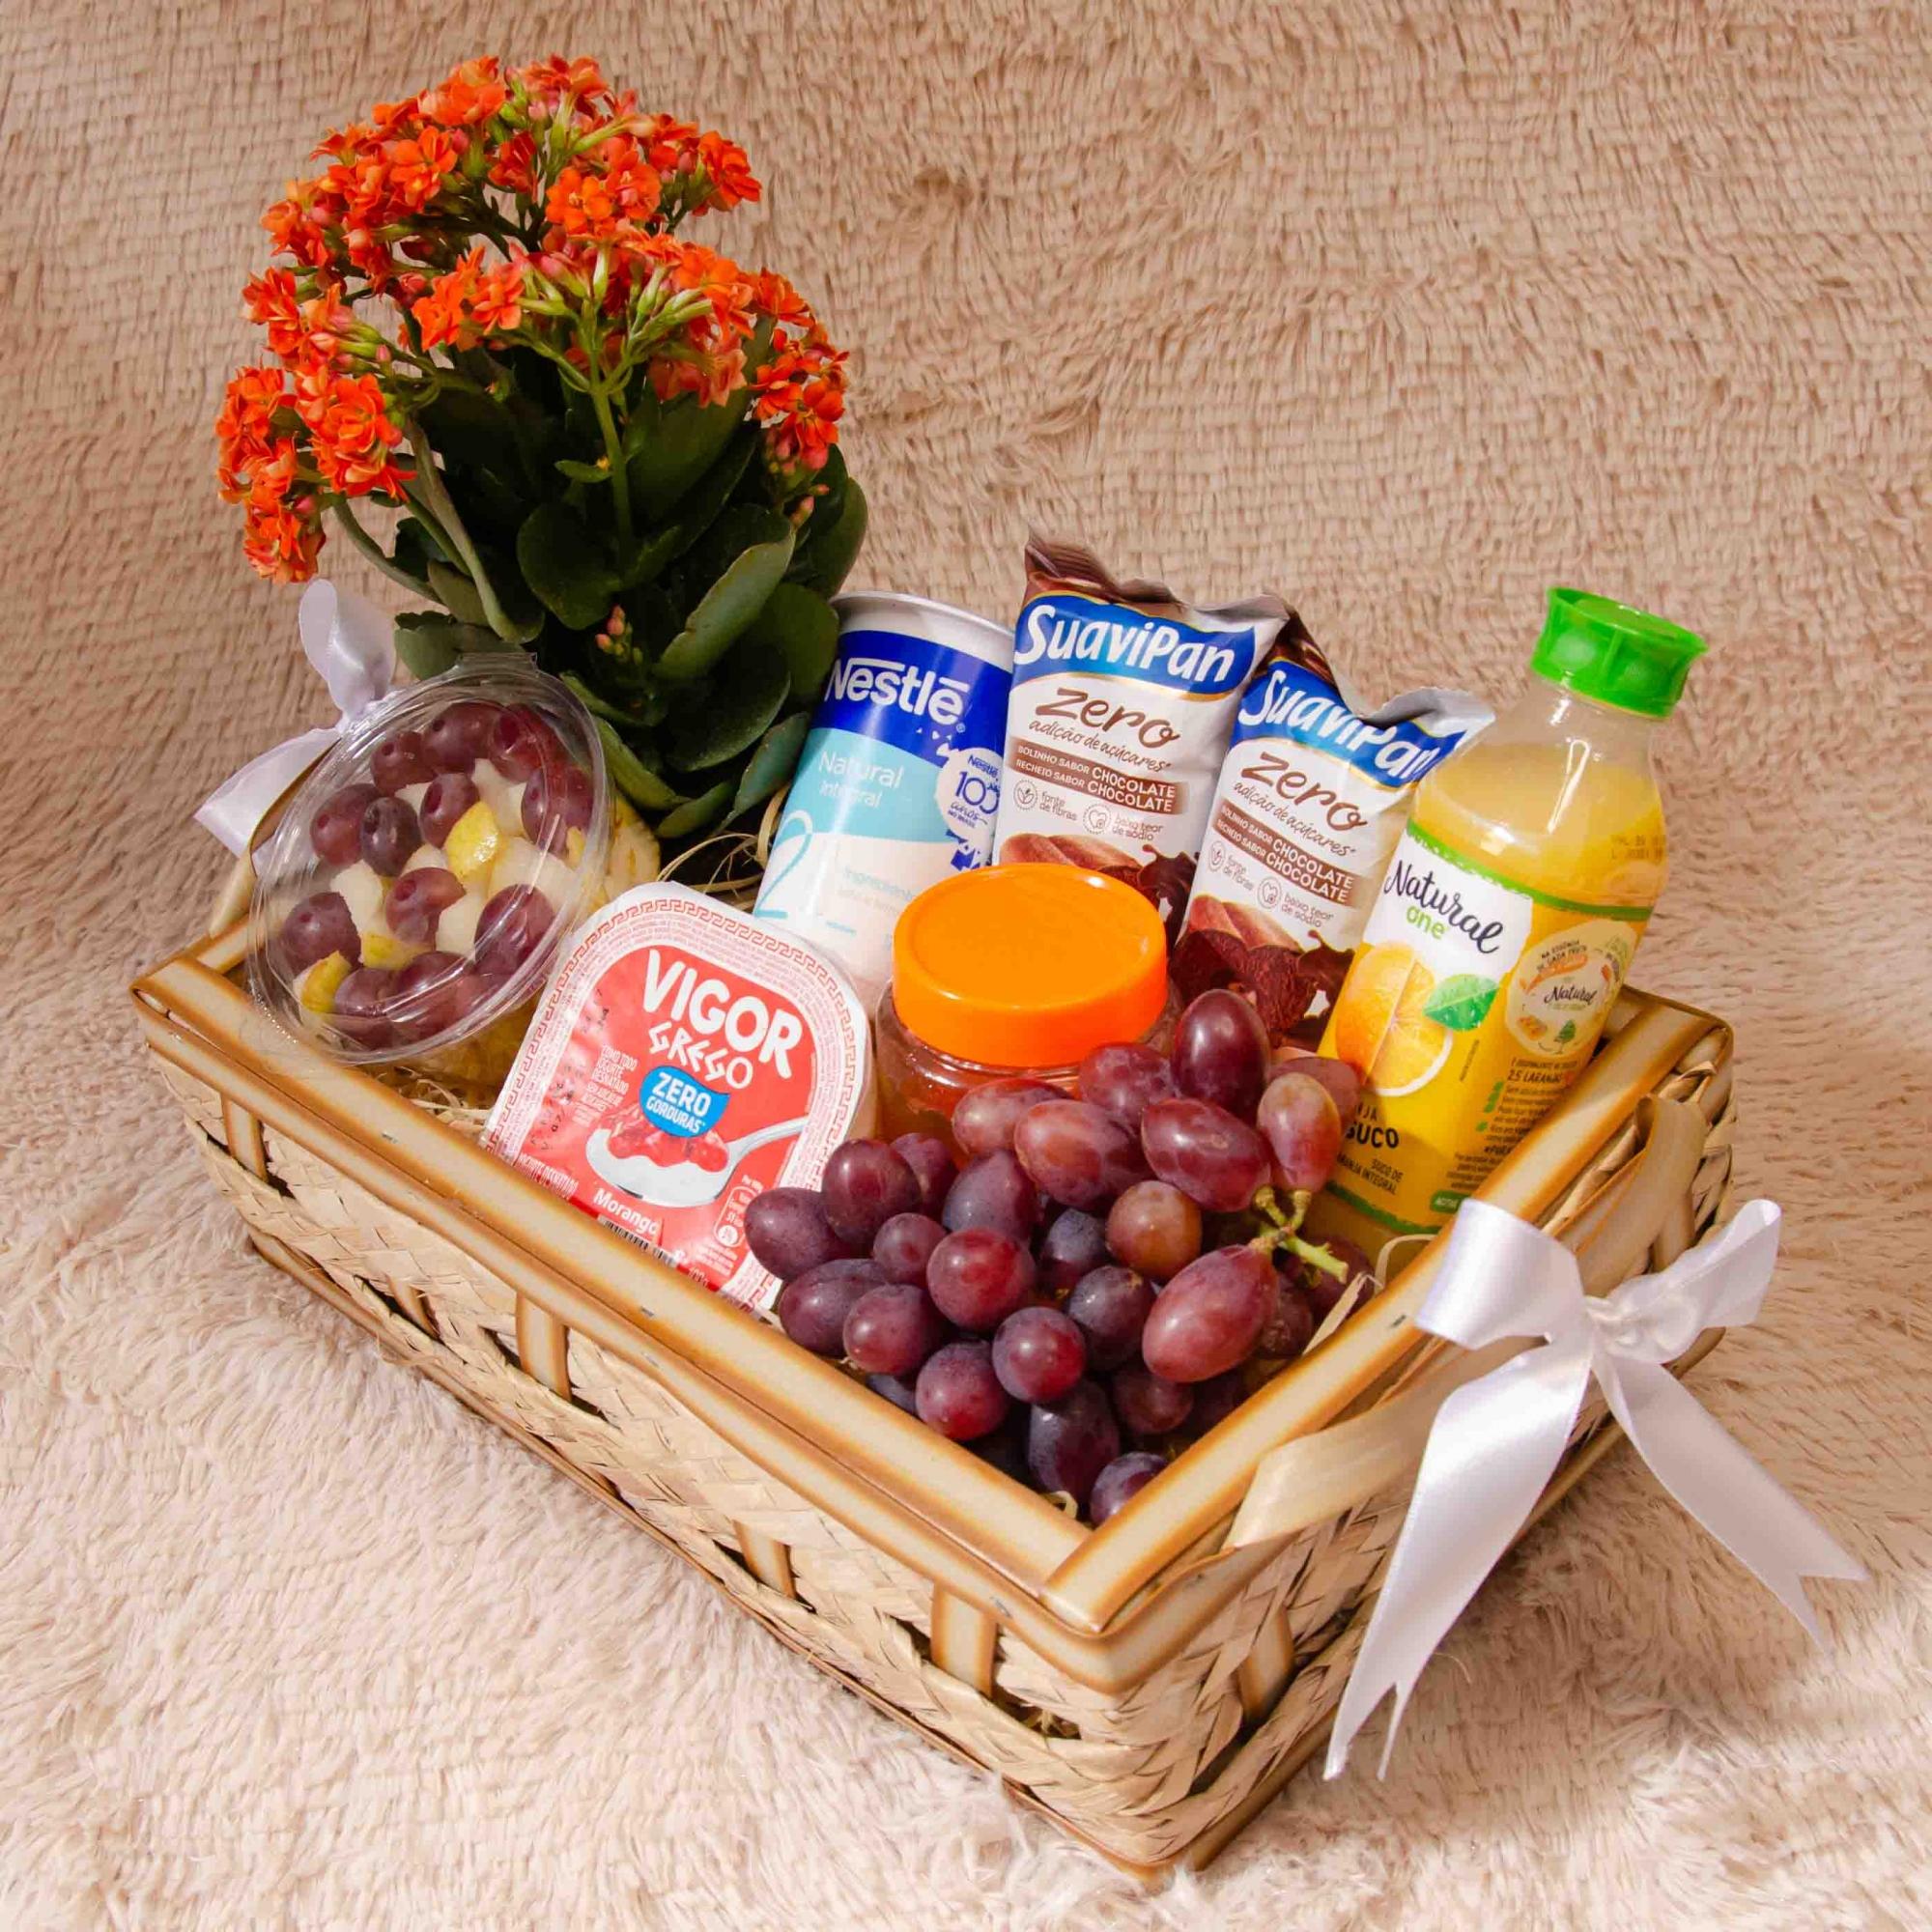 Mini Bandeja Fitness com Iogurtes, Fruta e Chocolates